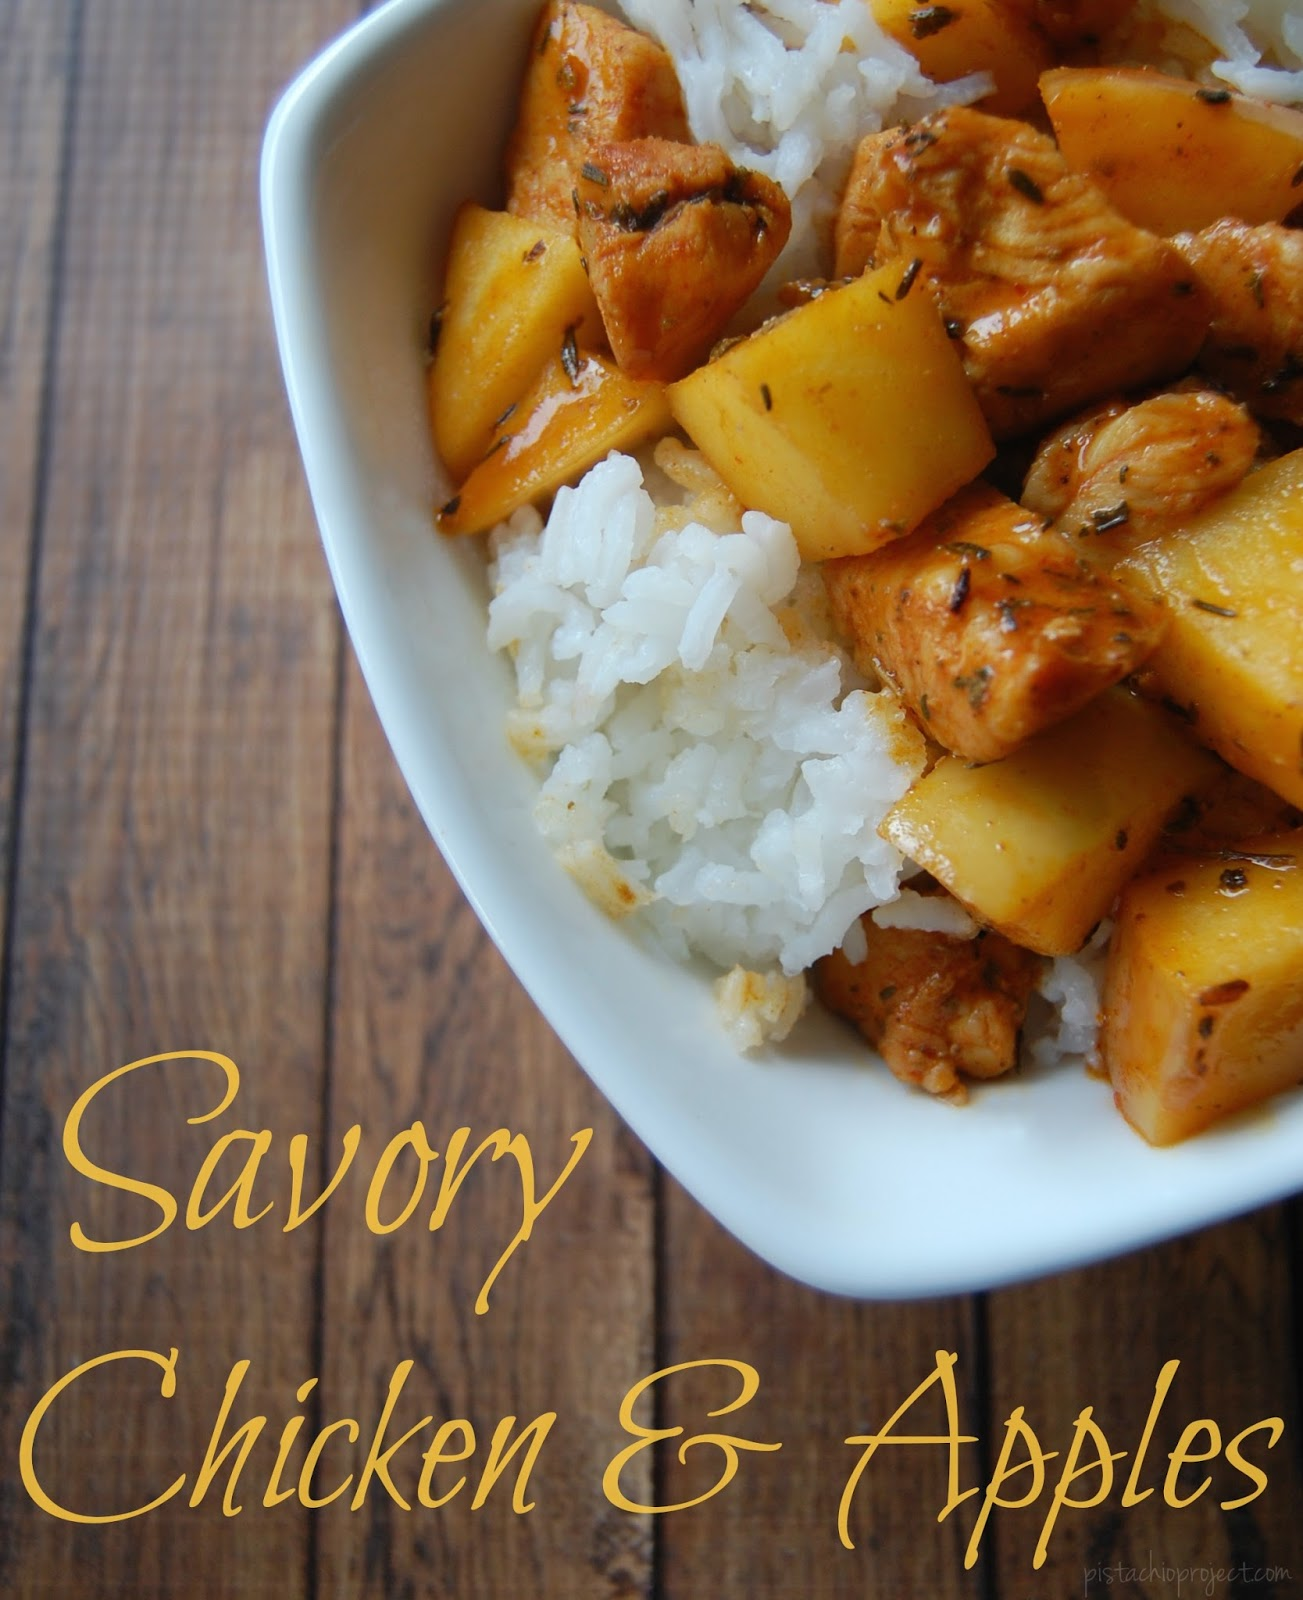 Savory Chicken Salad